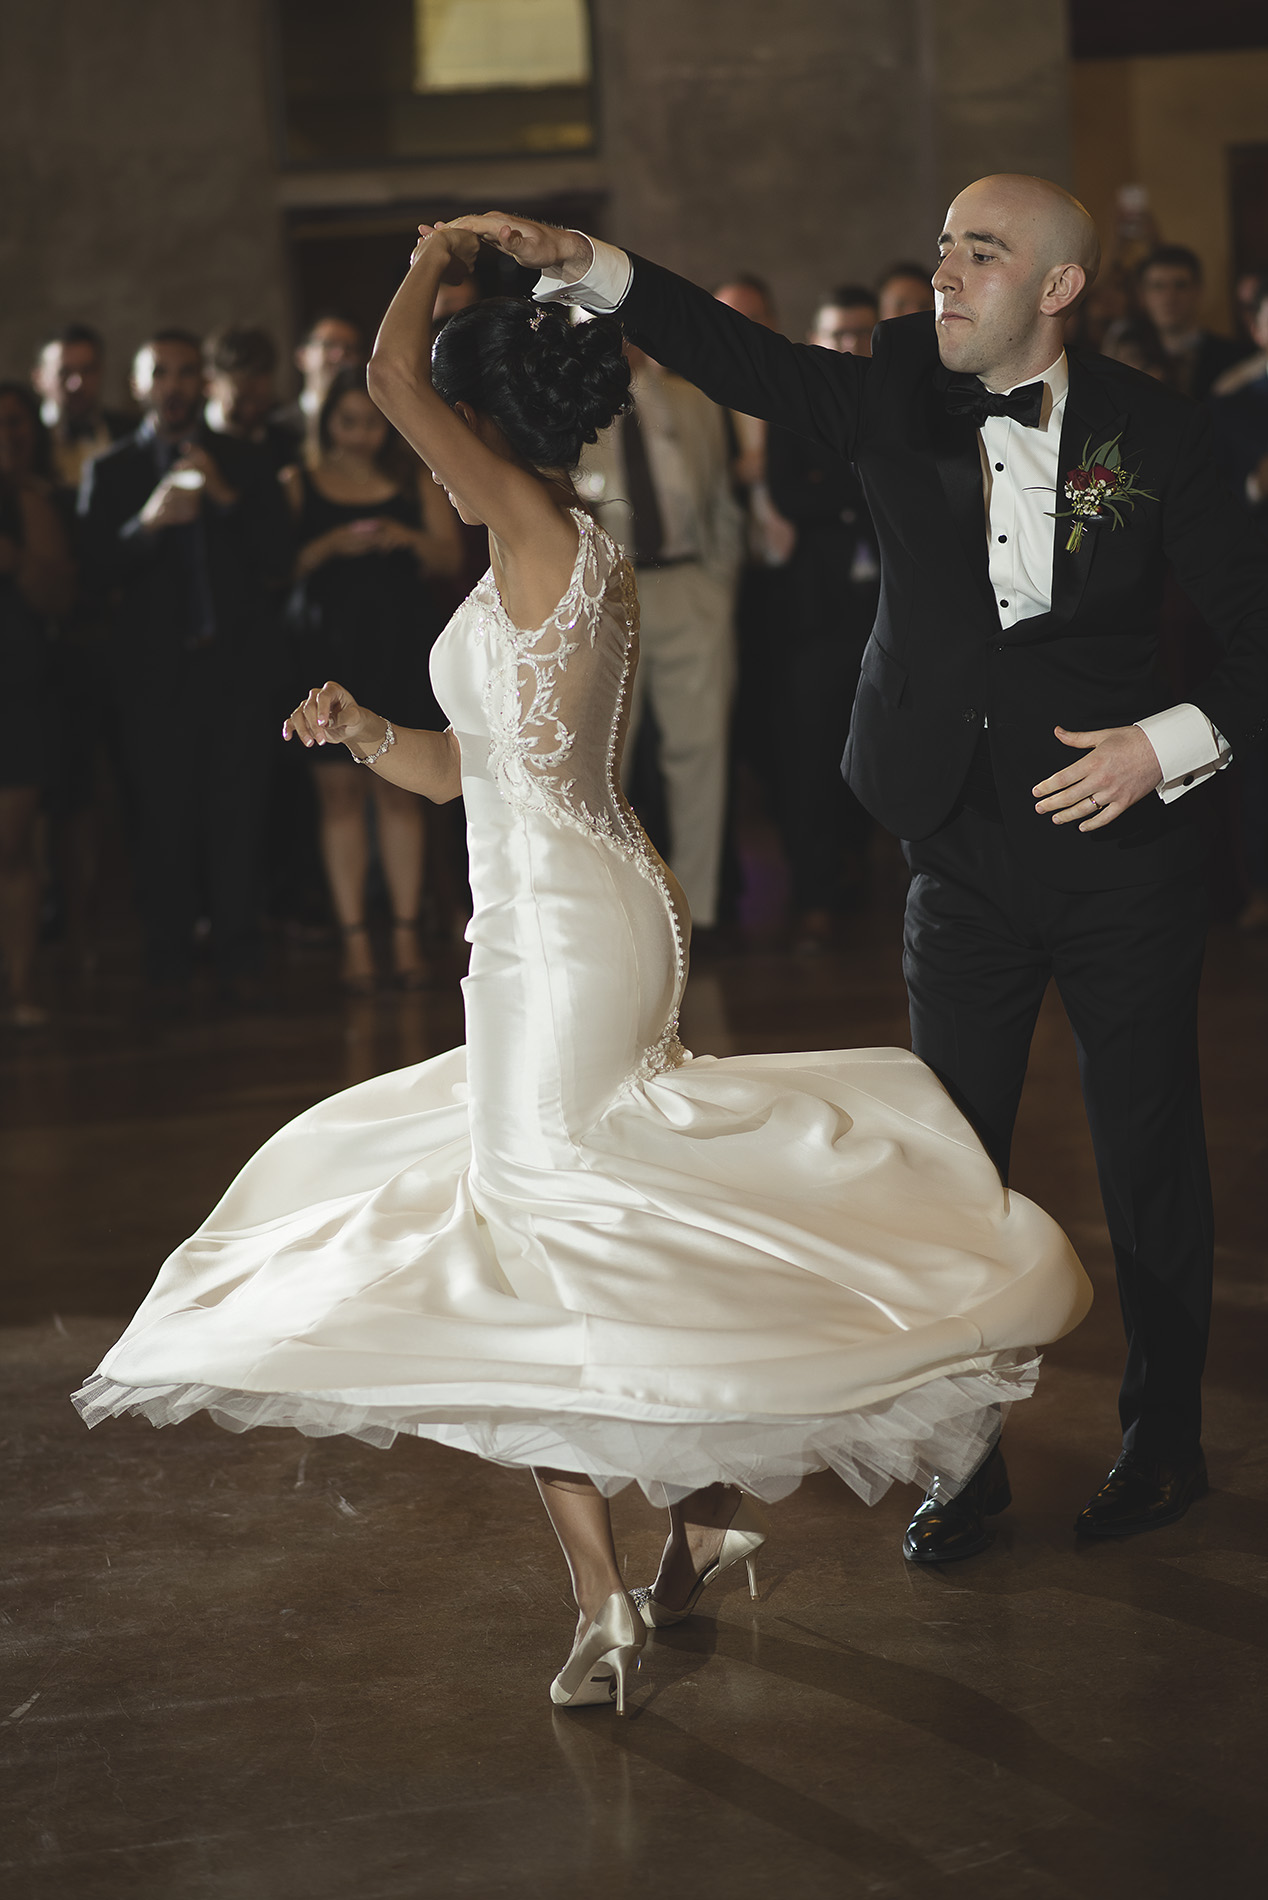 Houston-venue-Olde-Dobbin-Station-Romantic-Classic-Wedding-Photographer-094.jpg